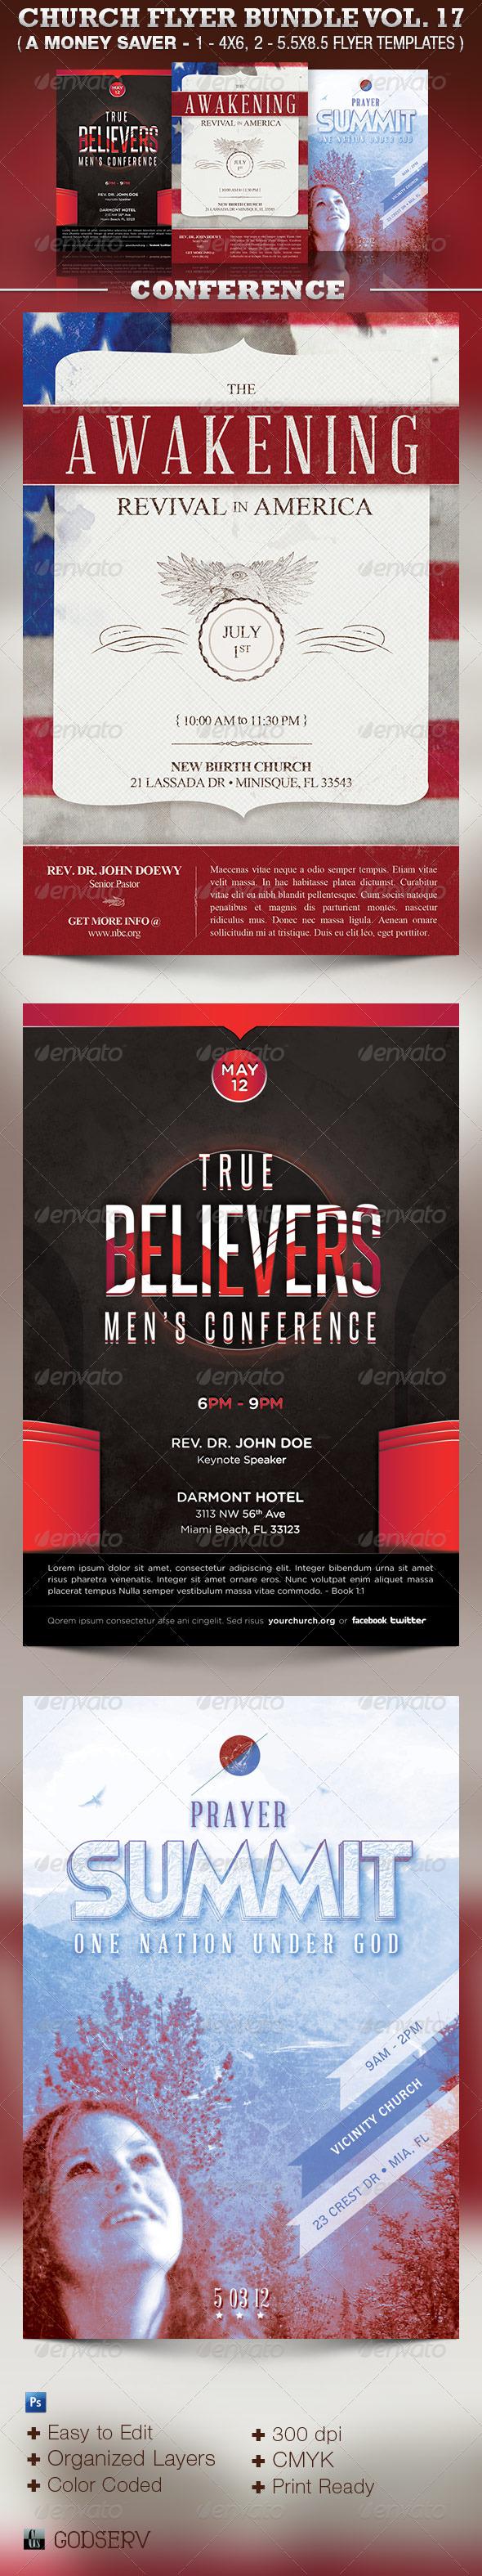 Conventions Church Flyer Template Bundle Vol 17 - Church Flyers